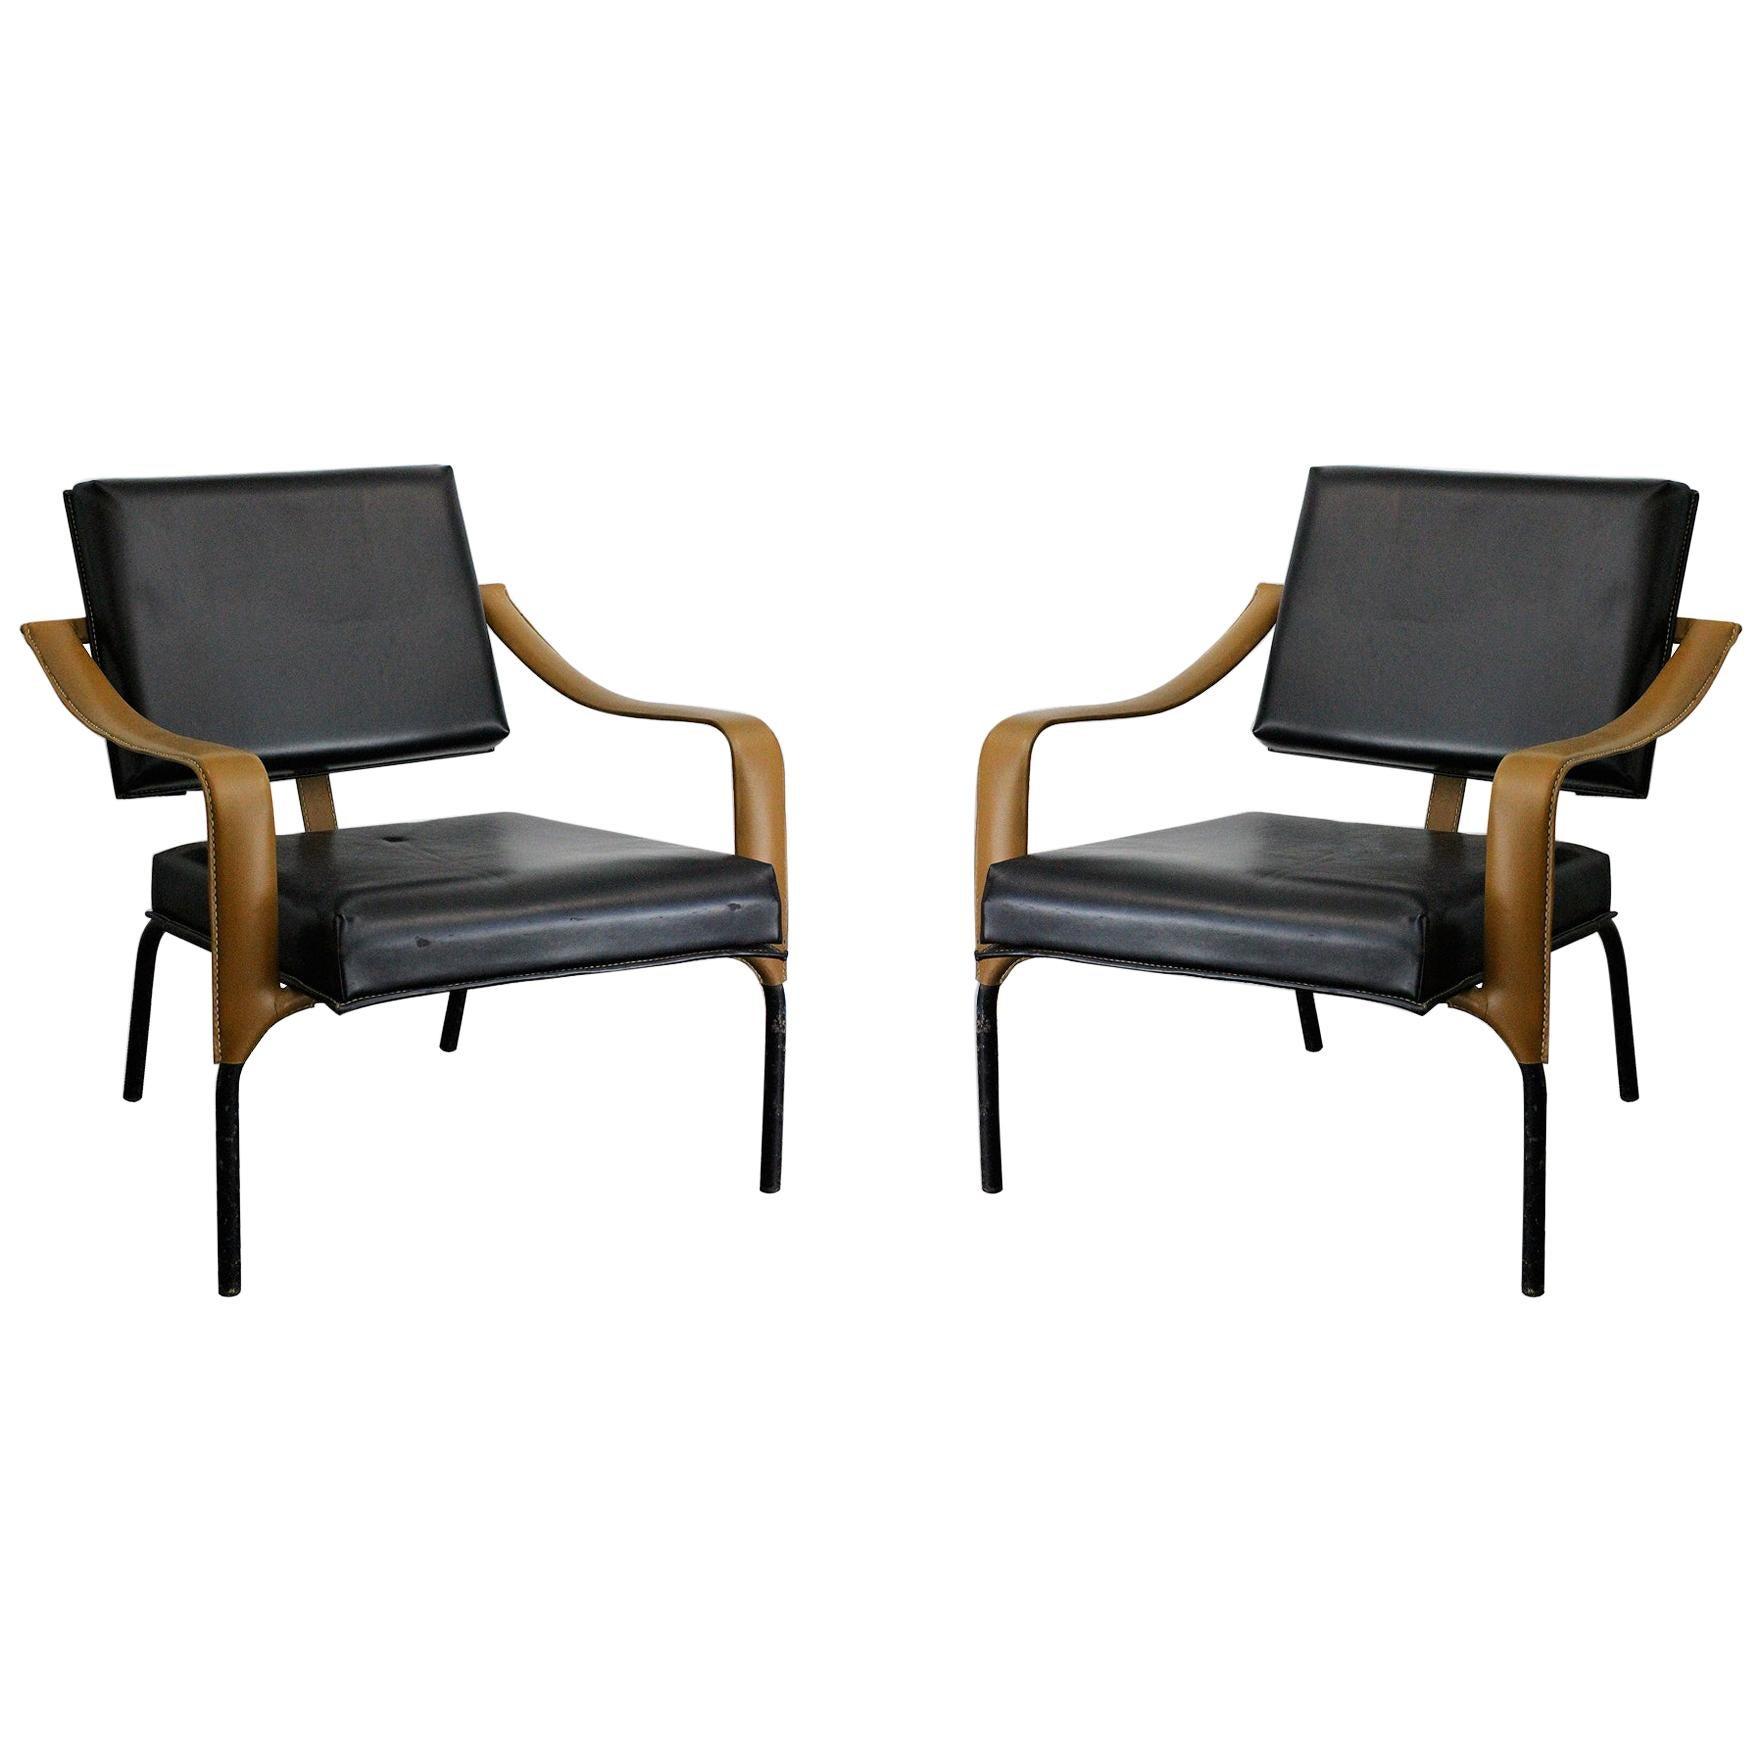 Jacques Adnet & Mercier Original Pair of Chairs 1955